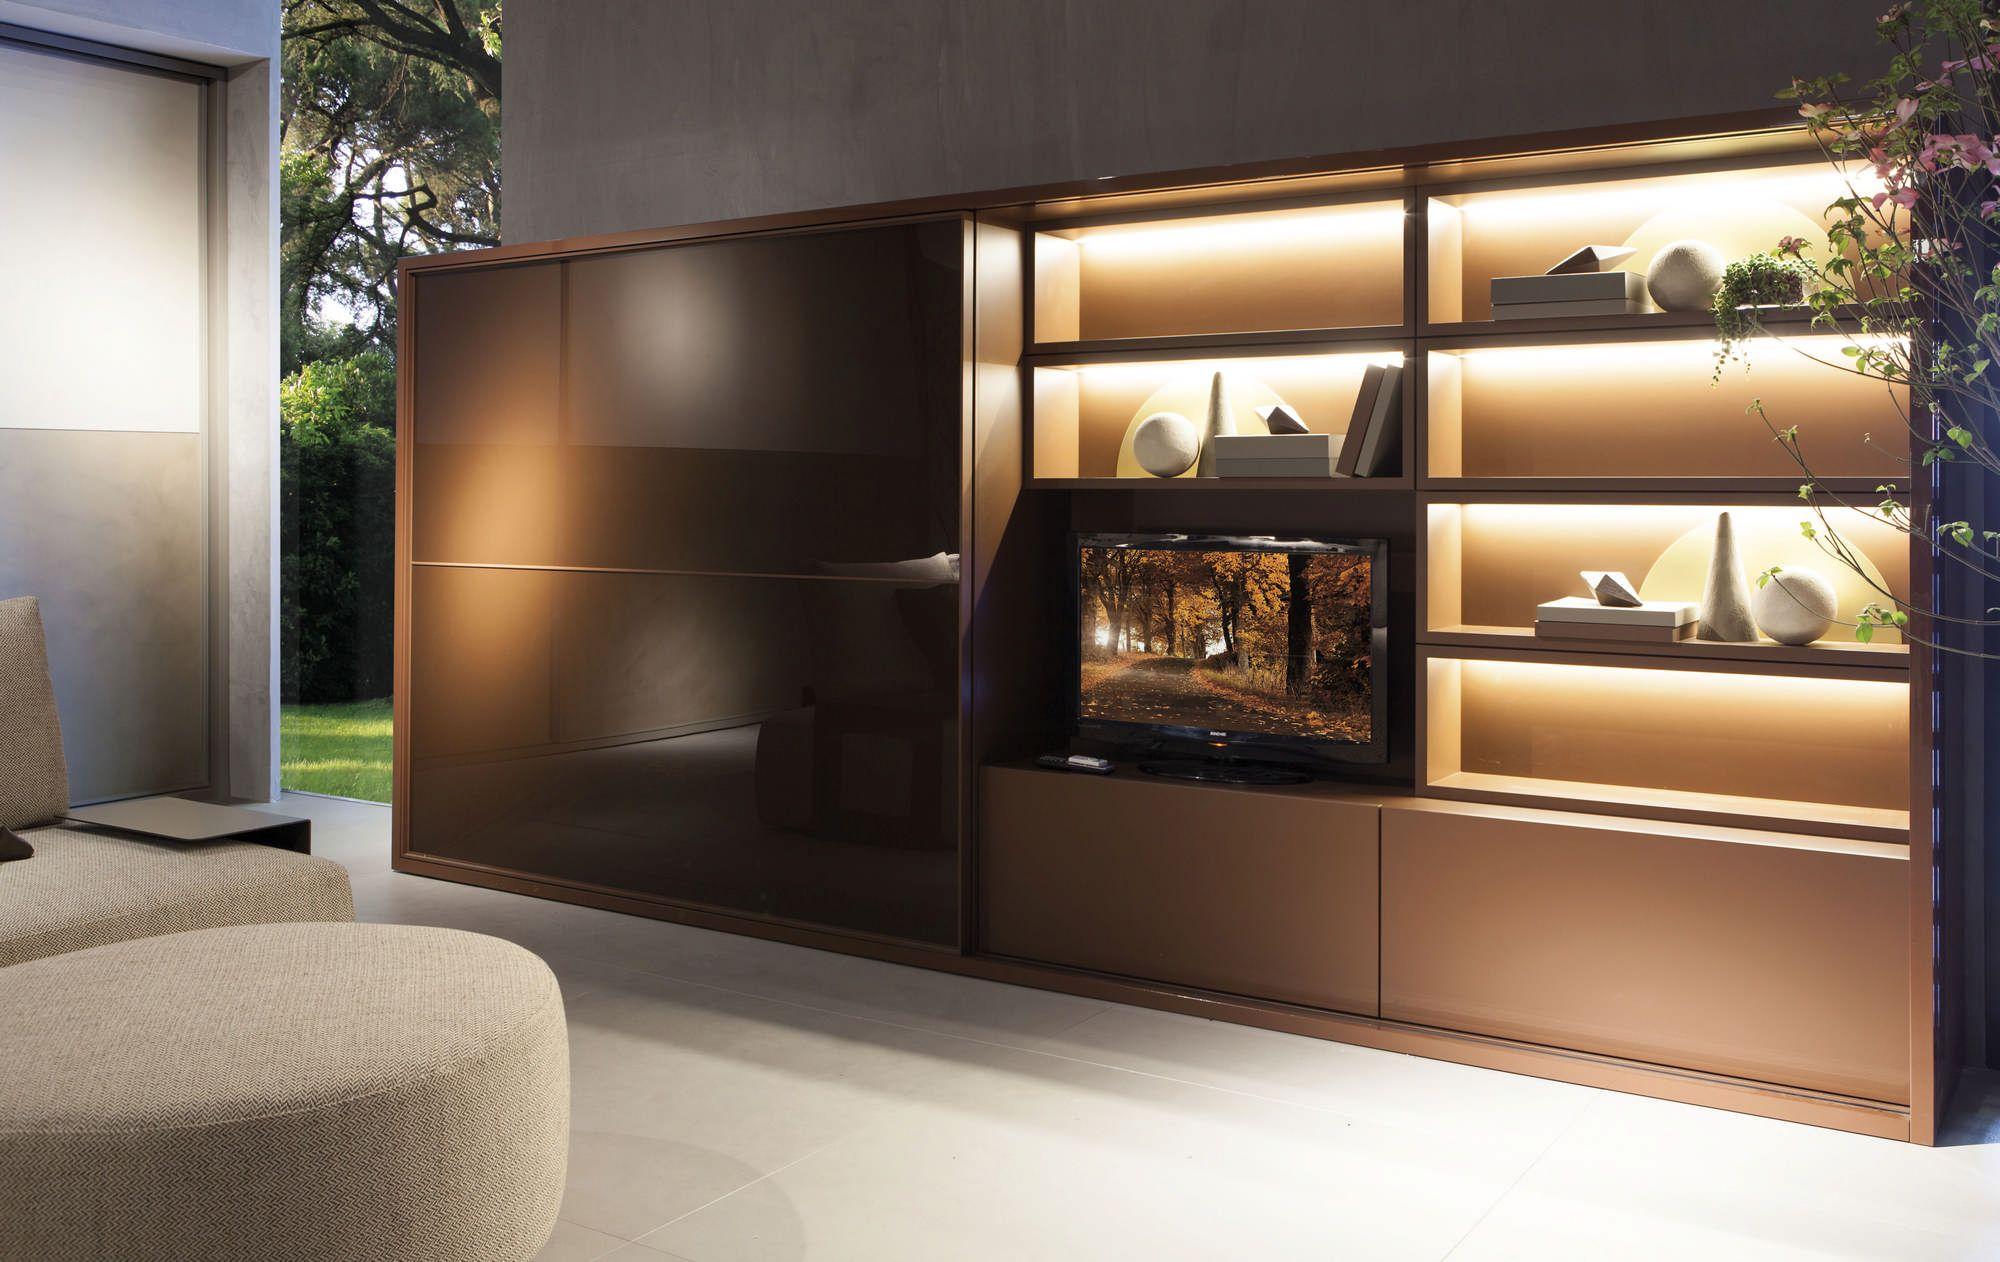 Meuble Tv Rangement Biblioth Que Design Fimes Italia Luxe  # Plan Des Meubles Tv Luxe